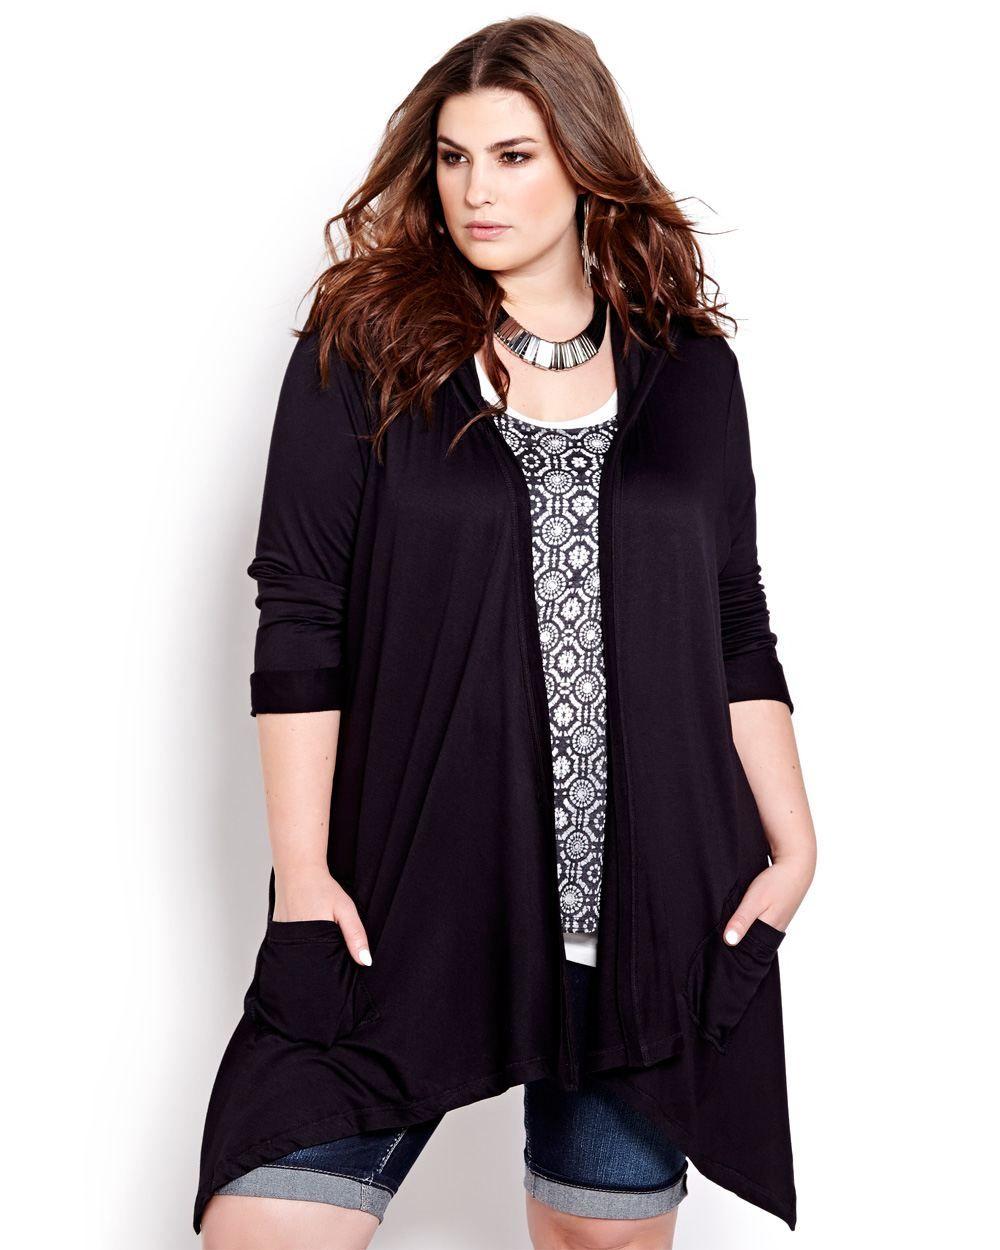 1eb8a7f3079 Lamodema | Womens Fashion Wear | Womens Fashion Clothes | What MELODIE  should wear | Fashion, Womens fashion, Fashion wear